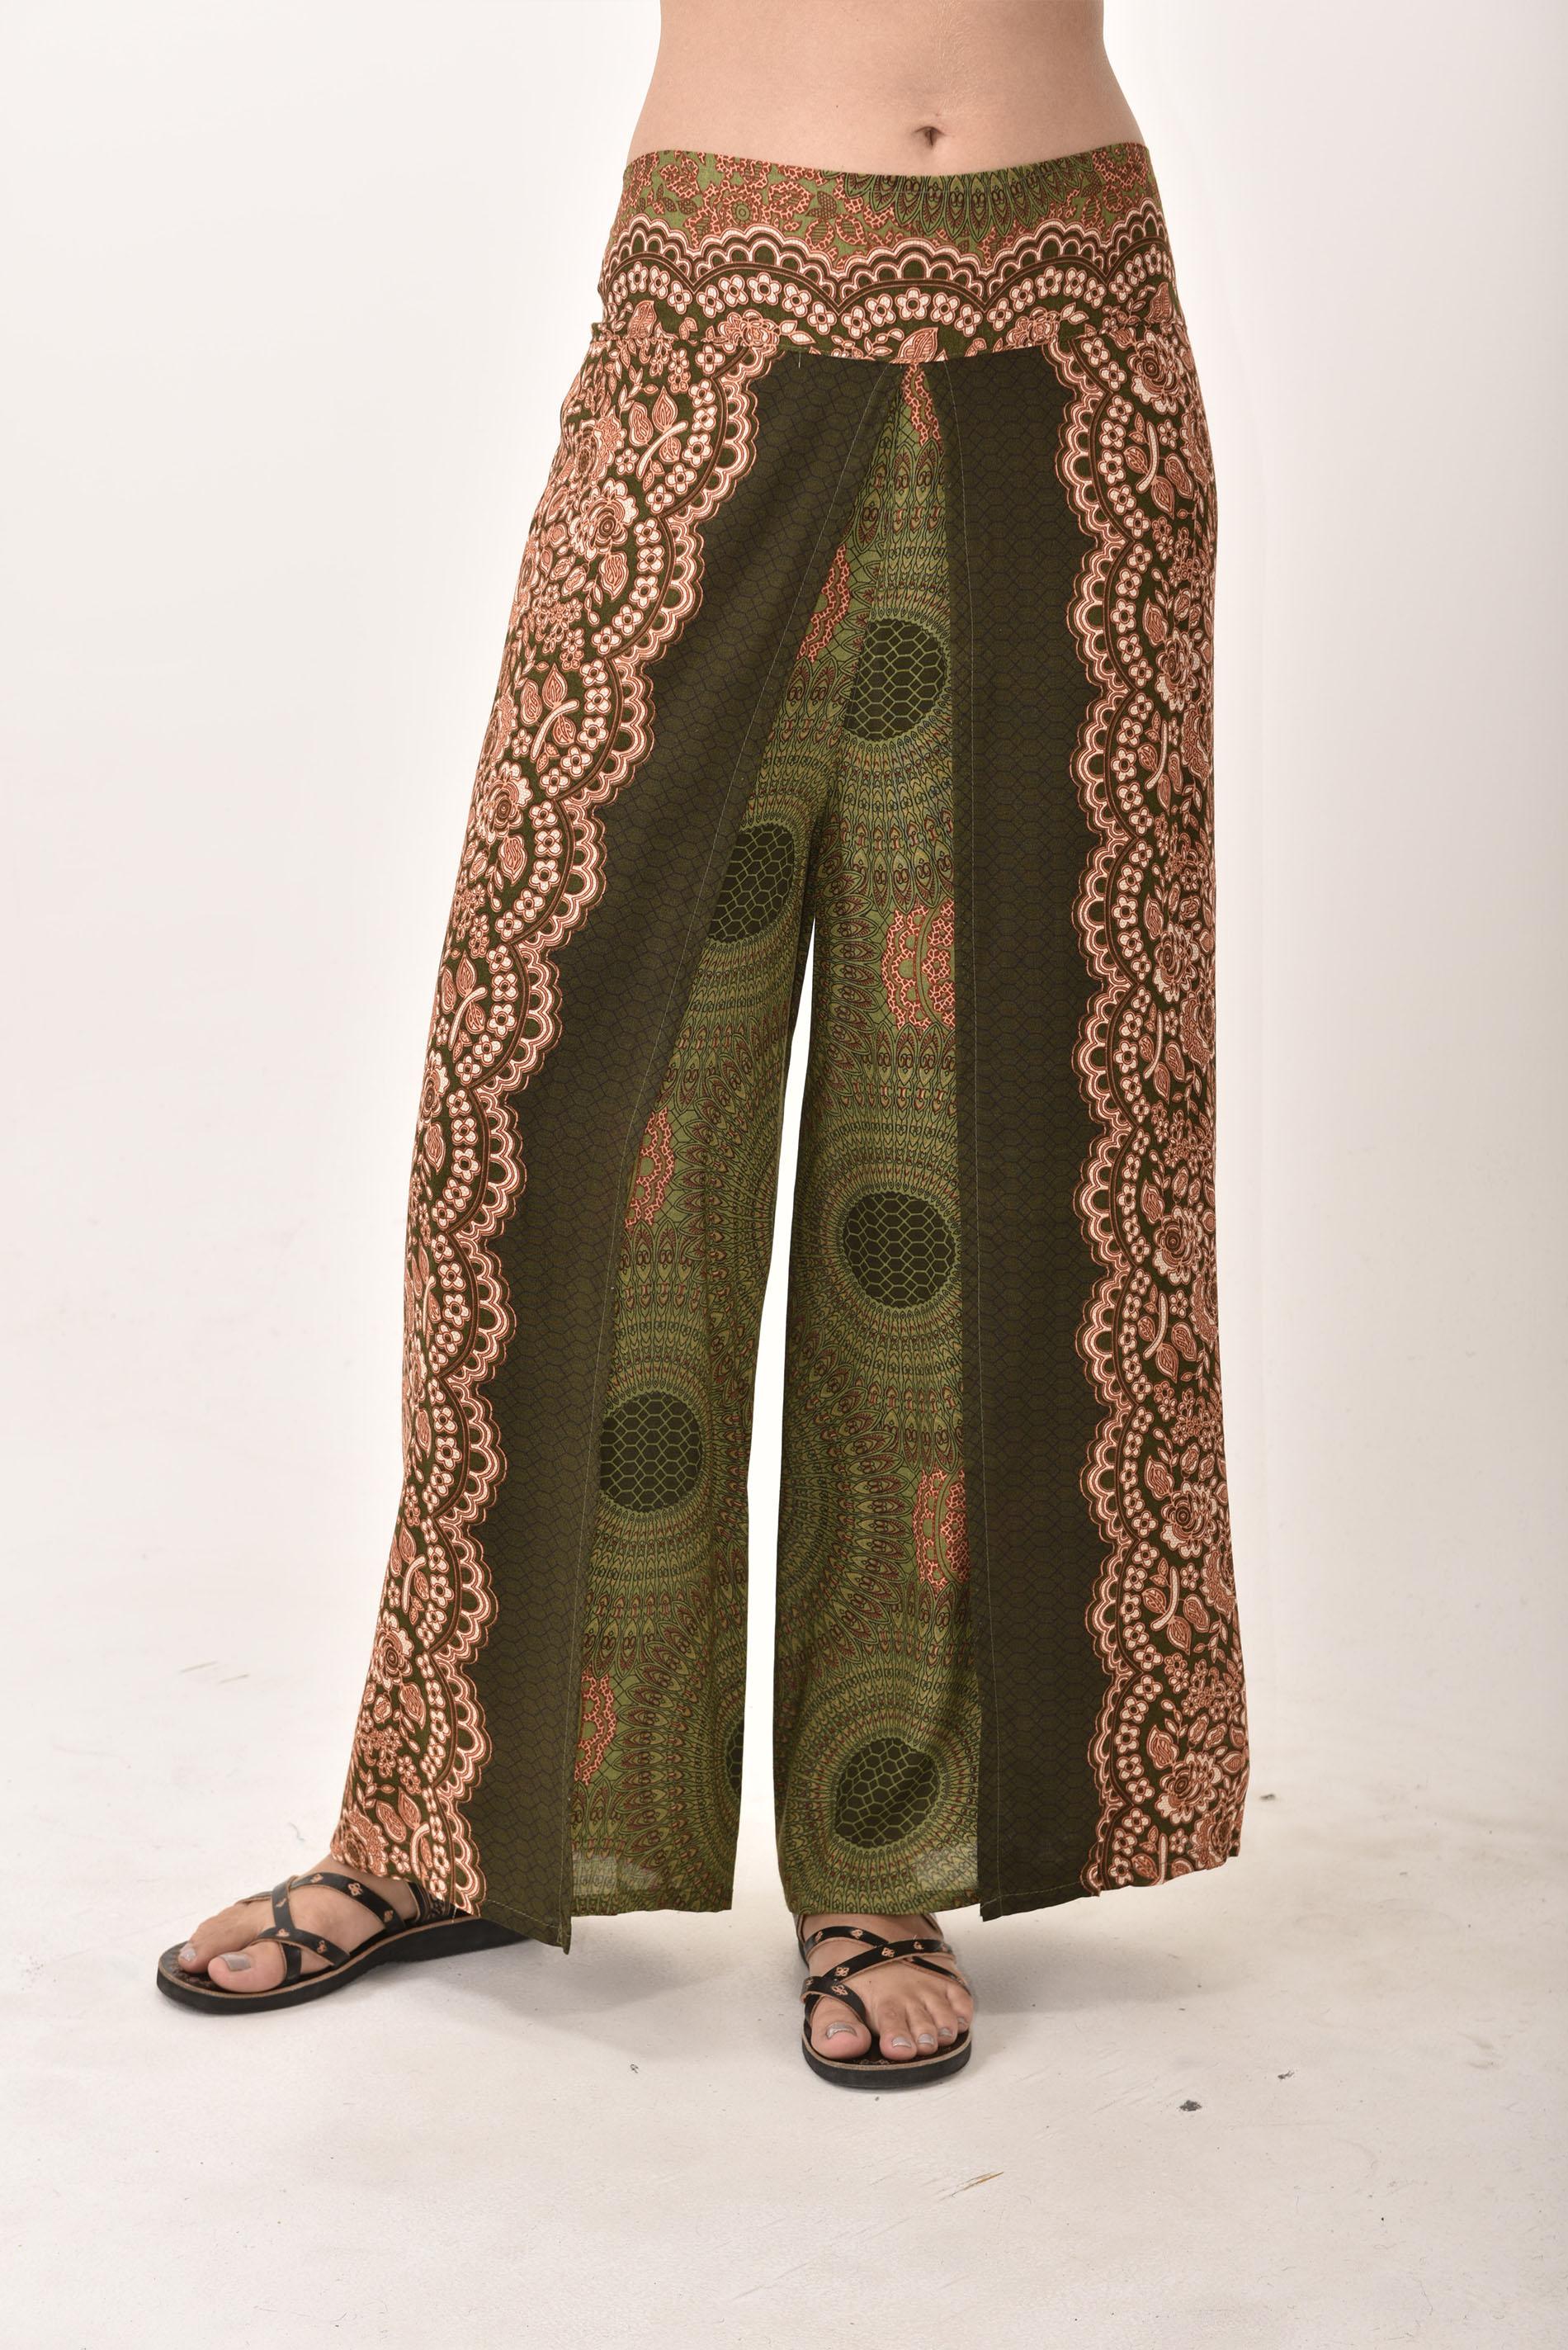 Honeycomb Print Wrap Leg Print Pants - Olive